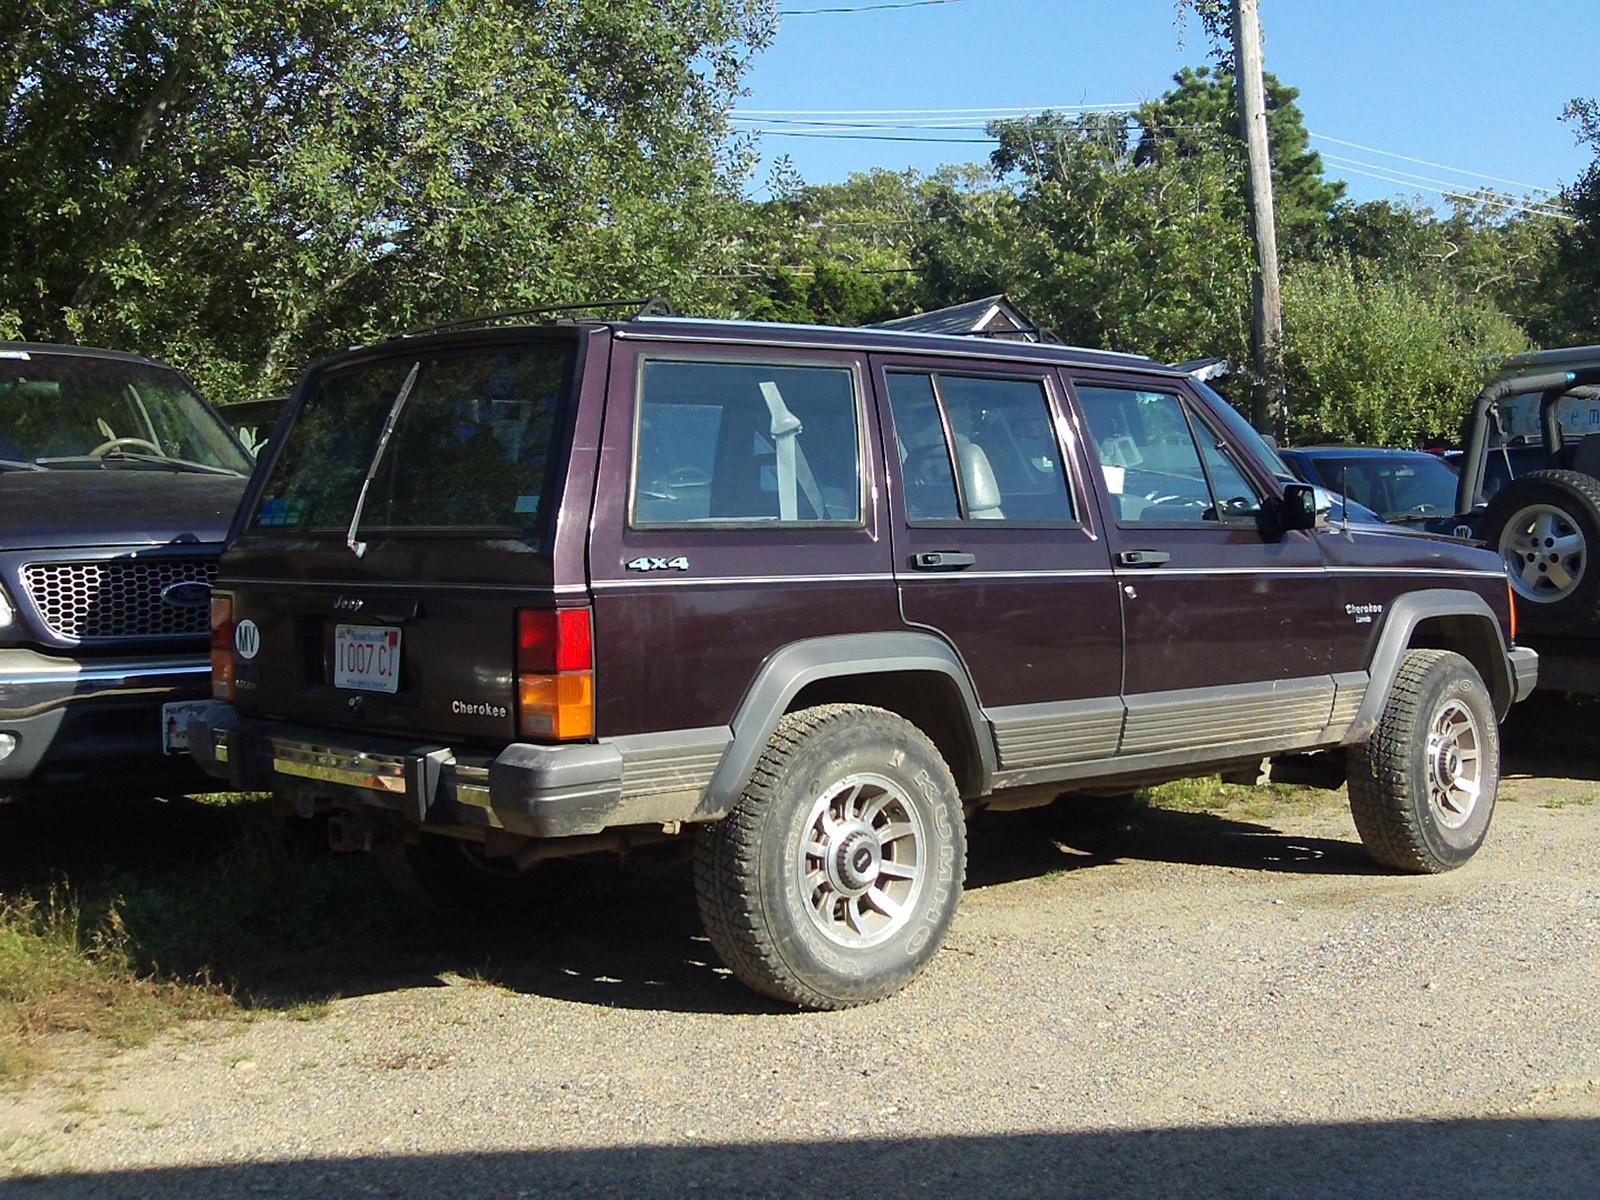 1981 jeep wagoneer pictures cargurus - 1984 Jeep Cherokee Overview Cargurus